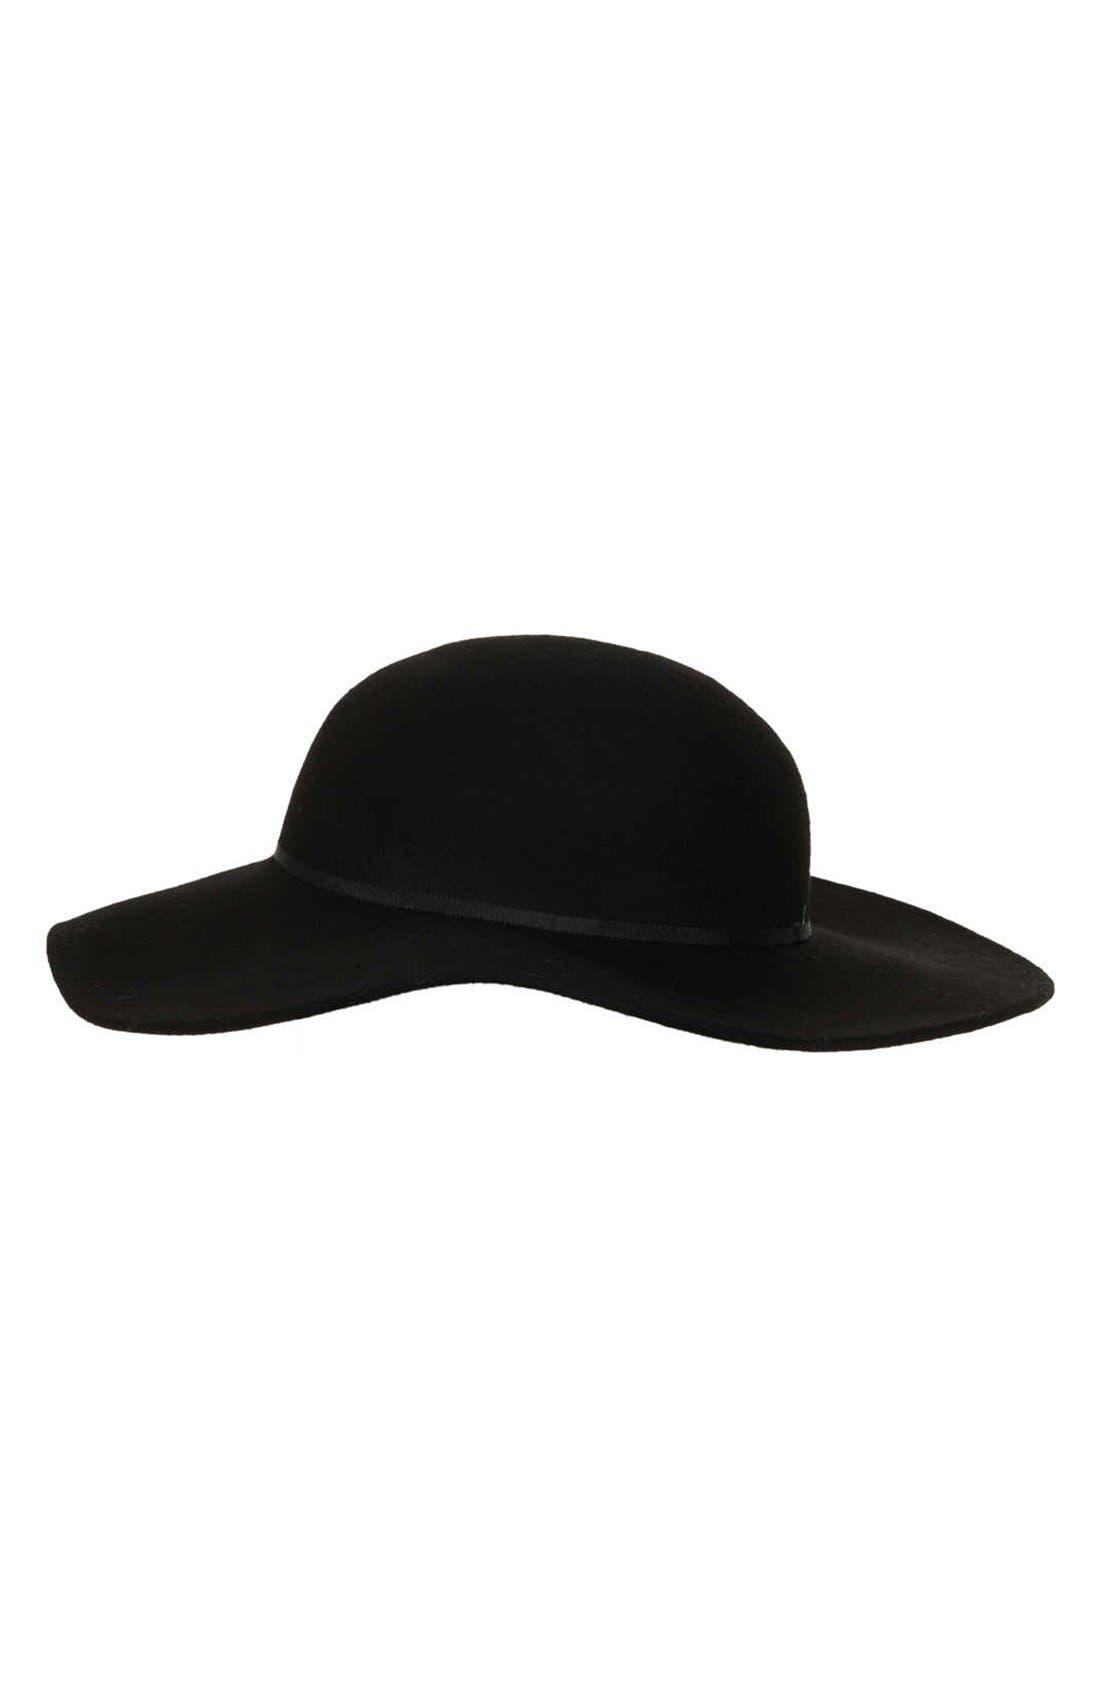 TOPSHOP Floppy Wool Felt Hat, Main, color, 001